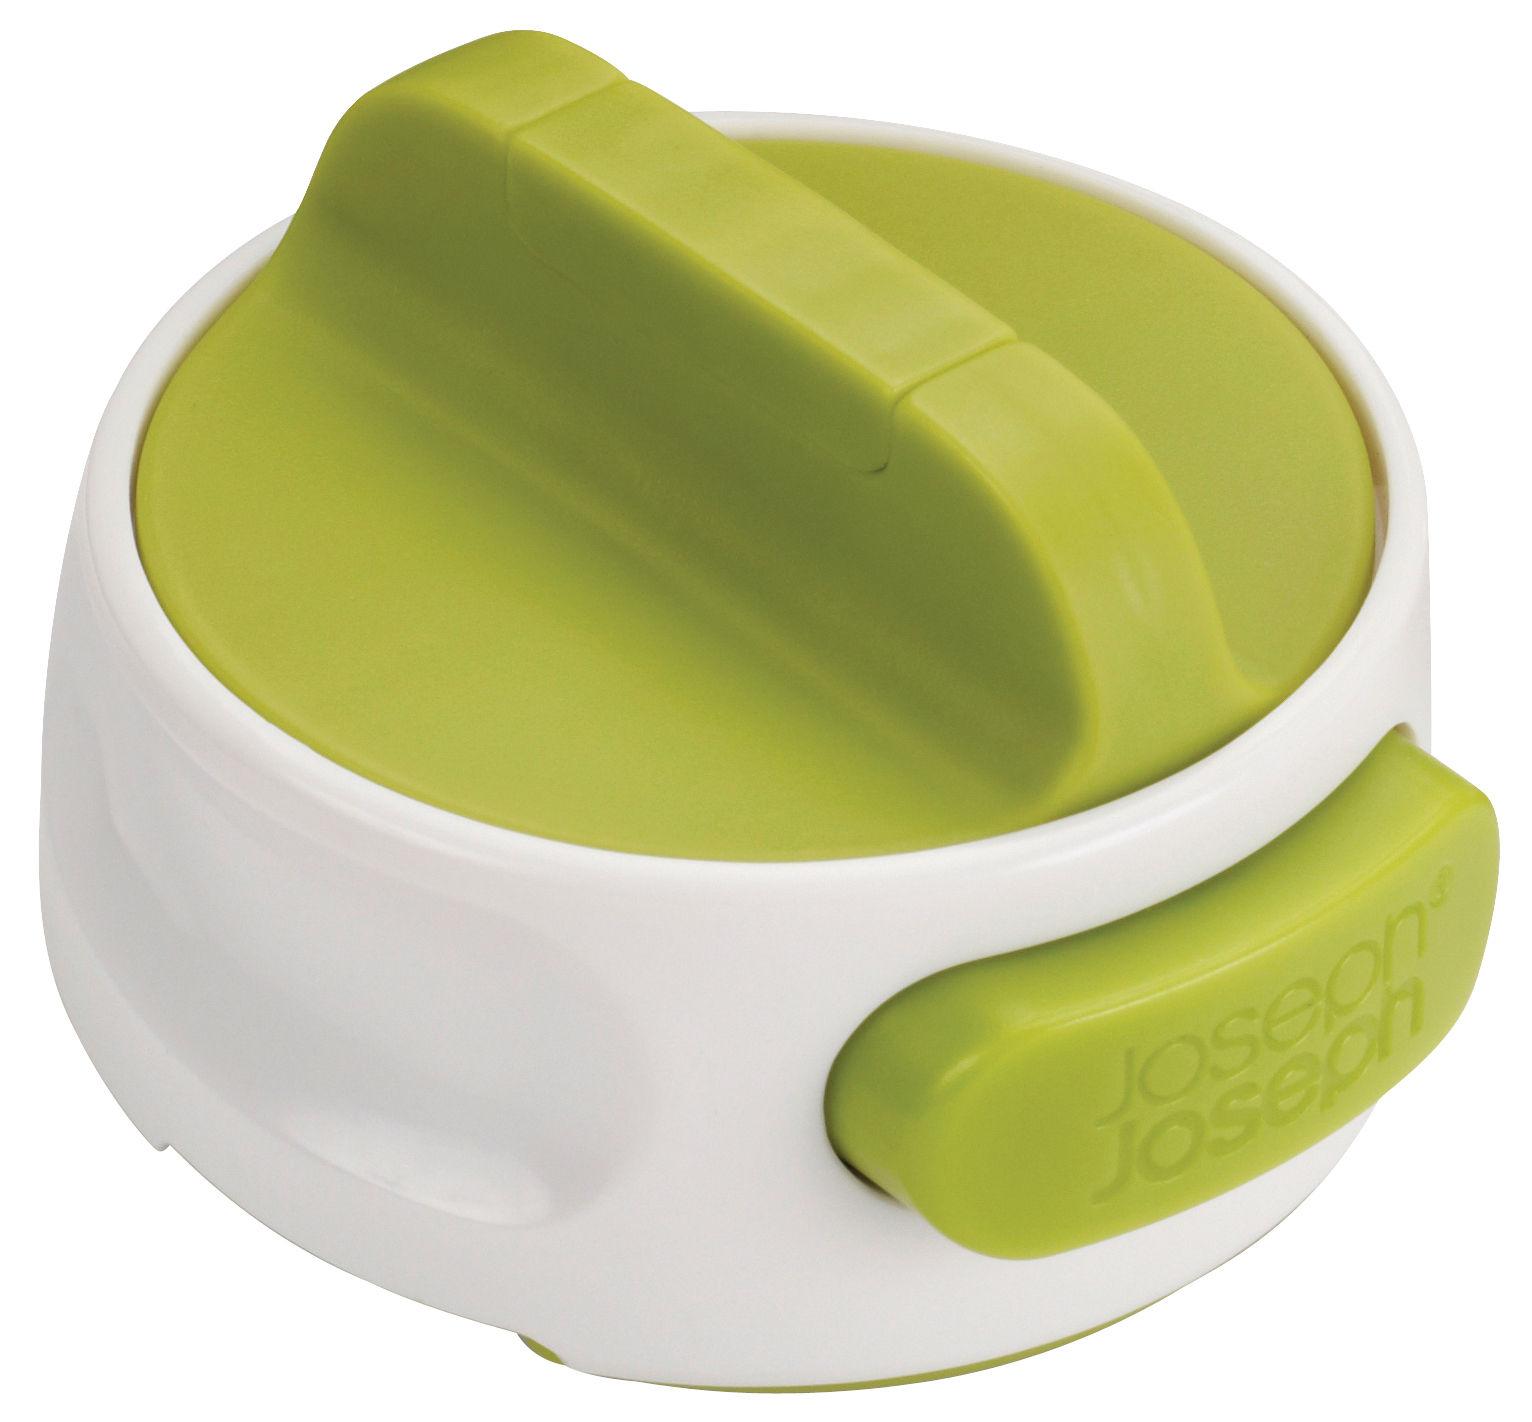 Kitchenware - Kitchen Equipment - Can-Do Tin opener by Joseph Joseph - Green / White - ABS, Nylon, Stainless steel